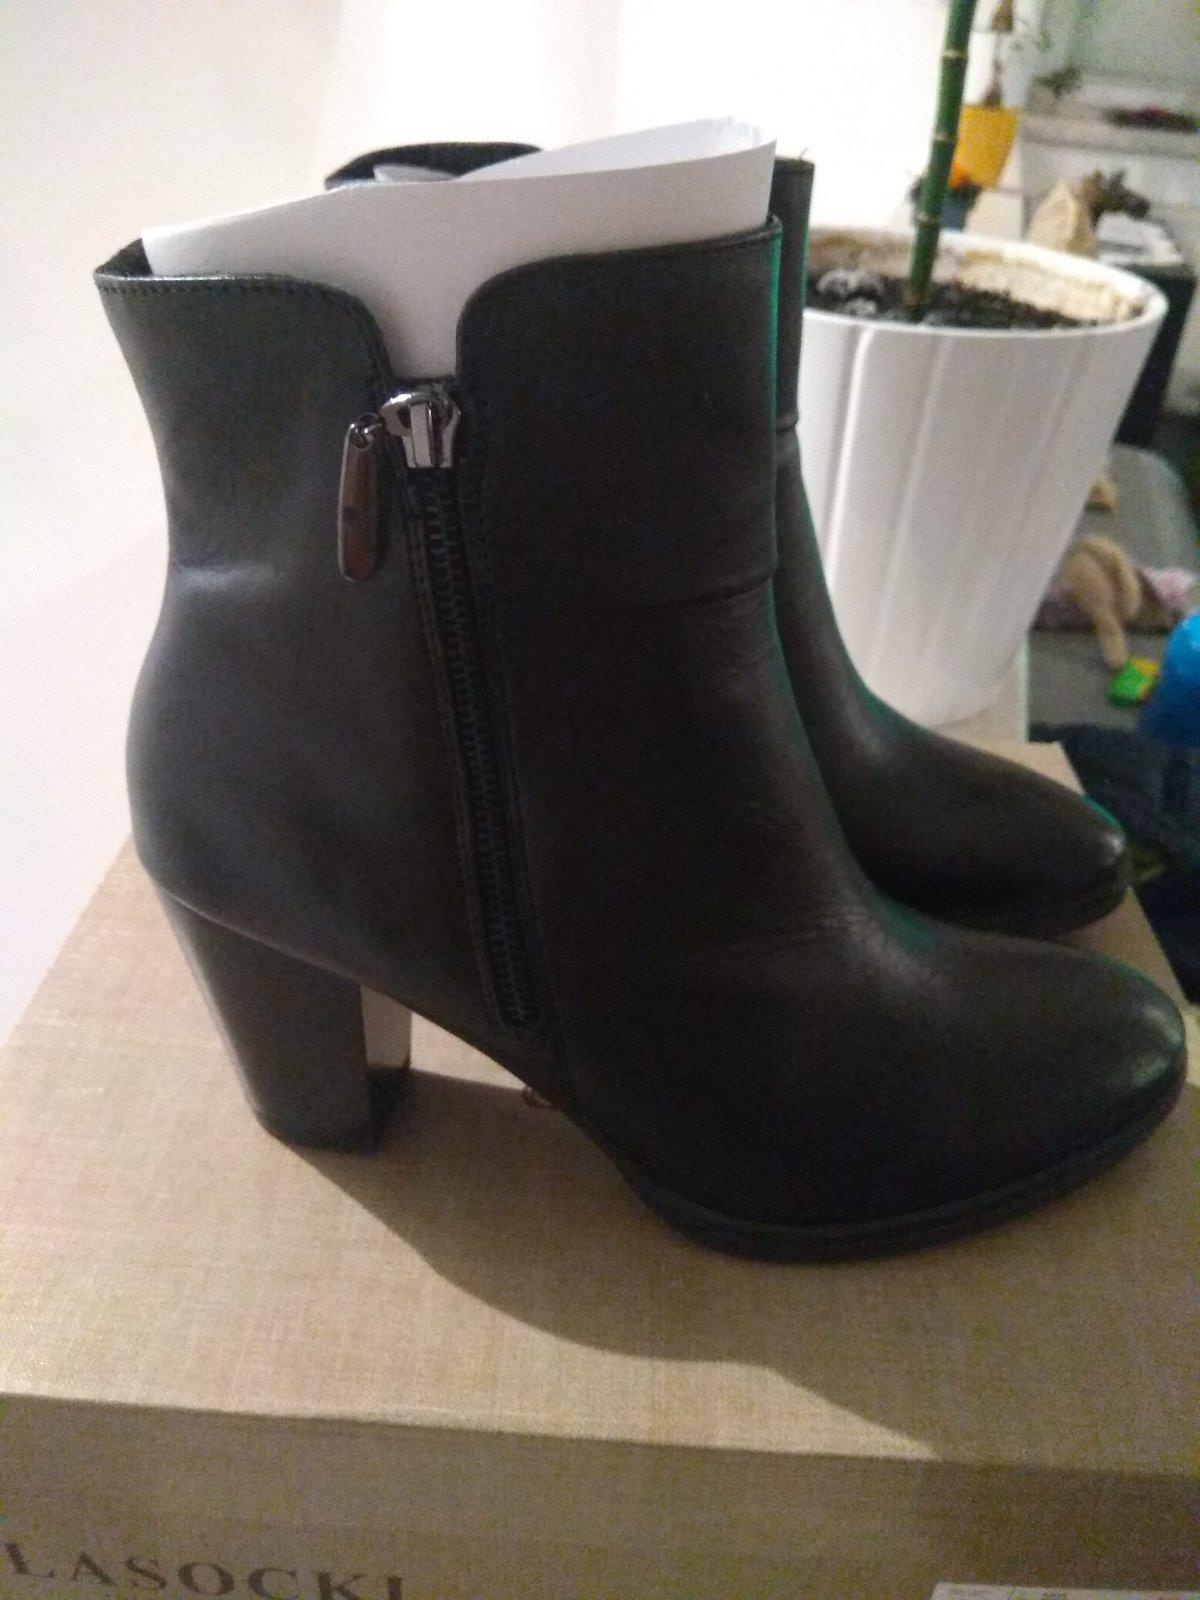 abf29815a9e5 Dámske kožené topánky lasocki